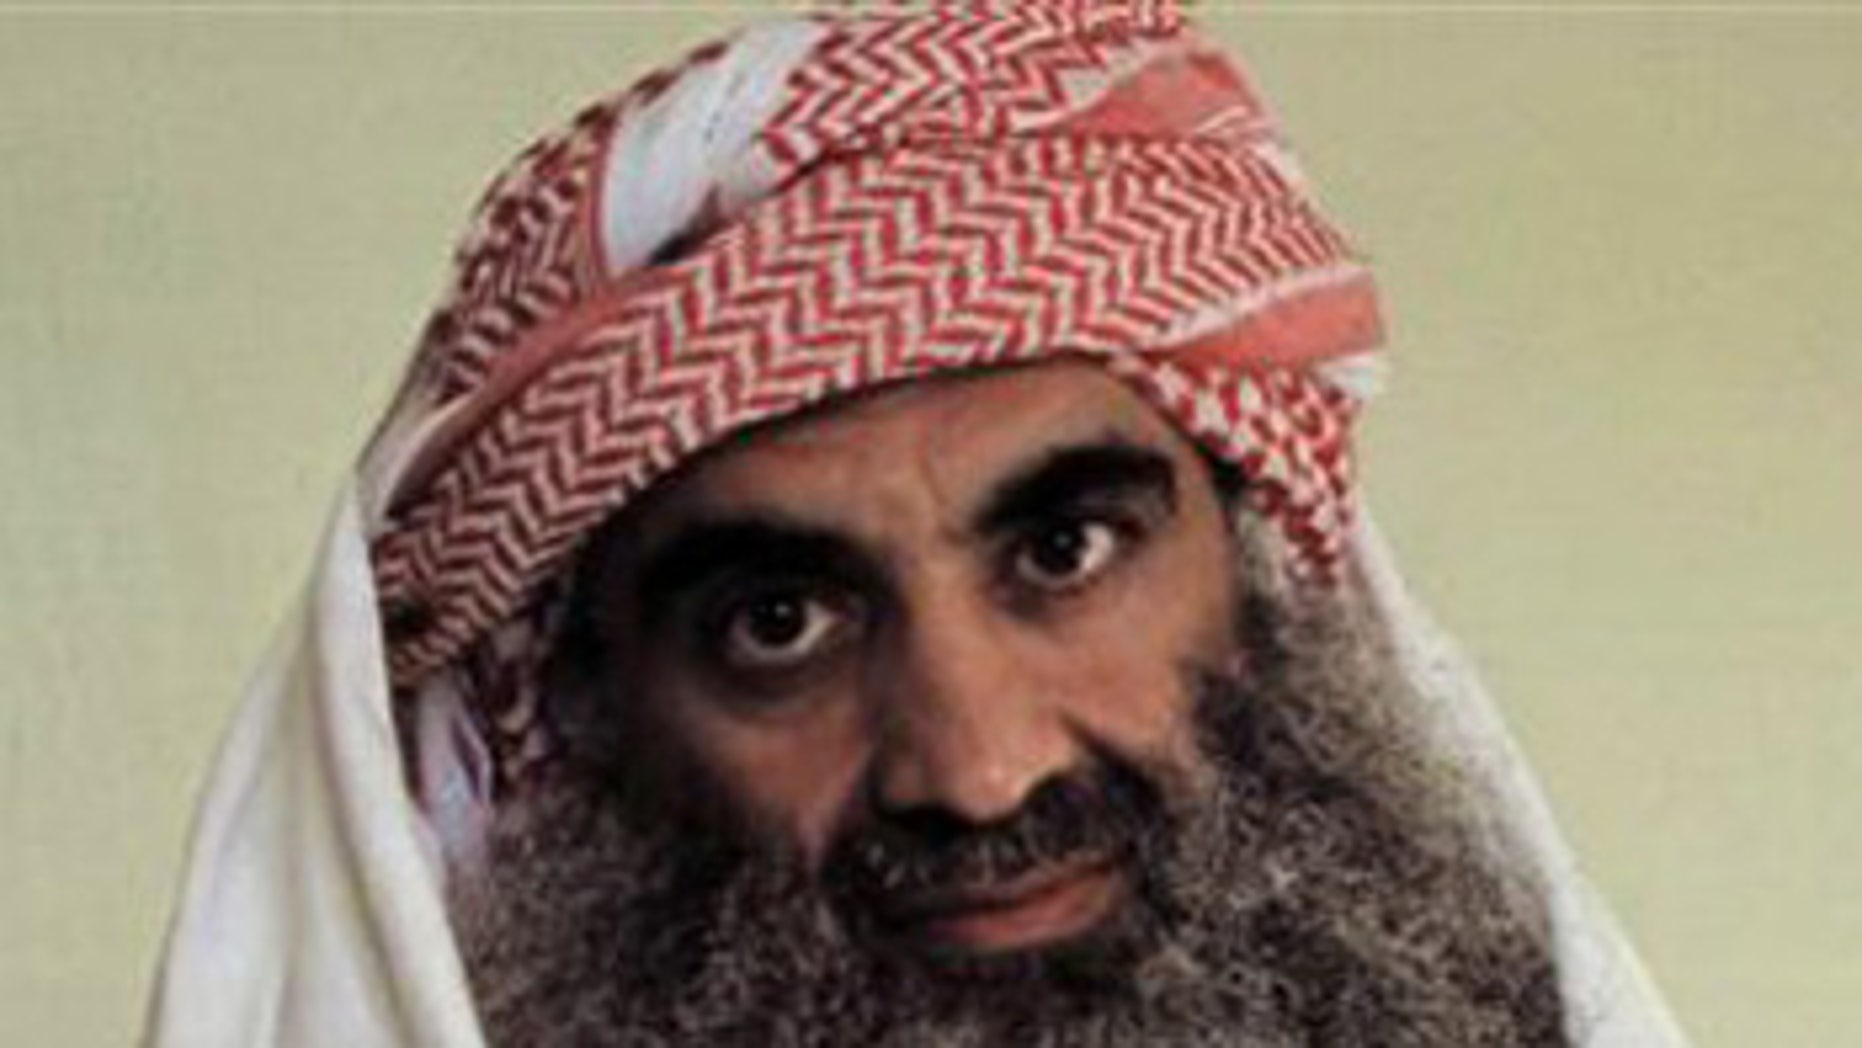 A man identified by an Arabic language Web site as Khalid Sheik Mohammed is seen in detention at Guantanamo Bay, Cuba.